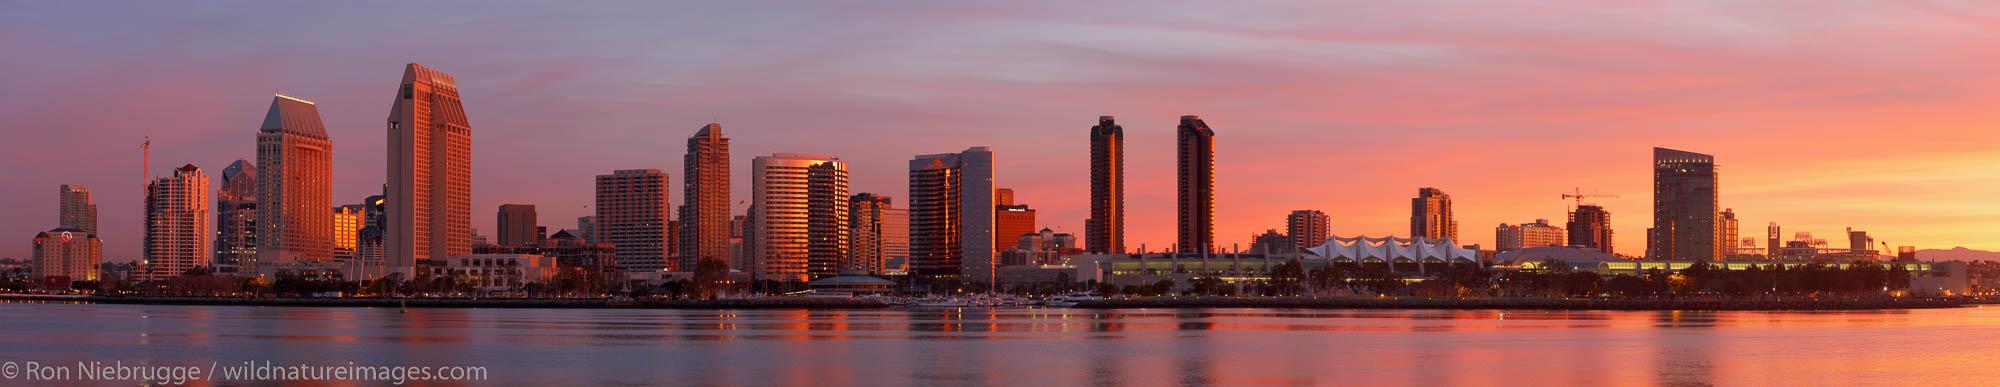 Panoramic of the San Diego skyline at surnrise, California.